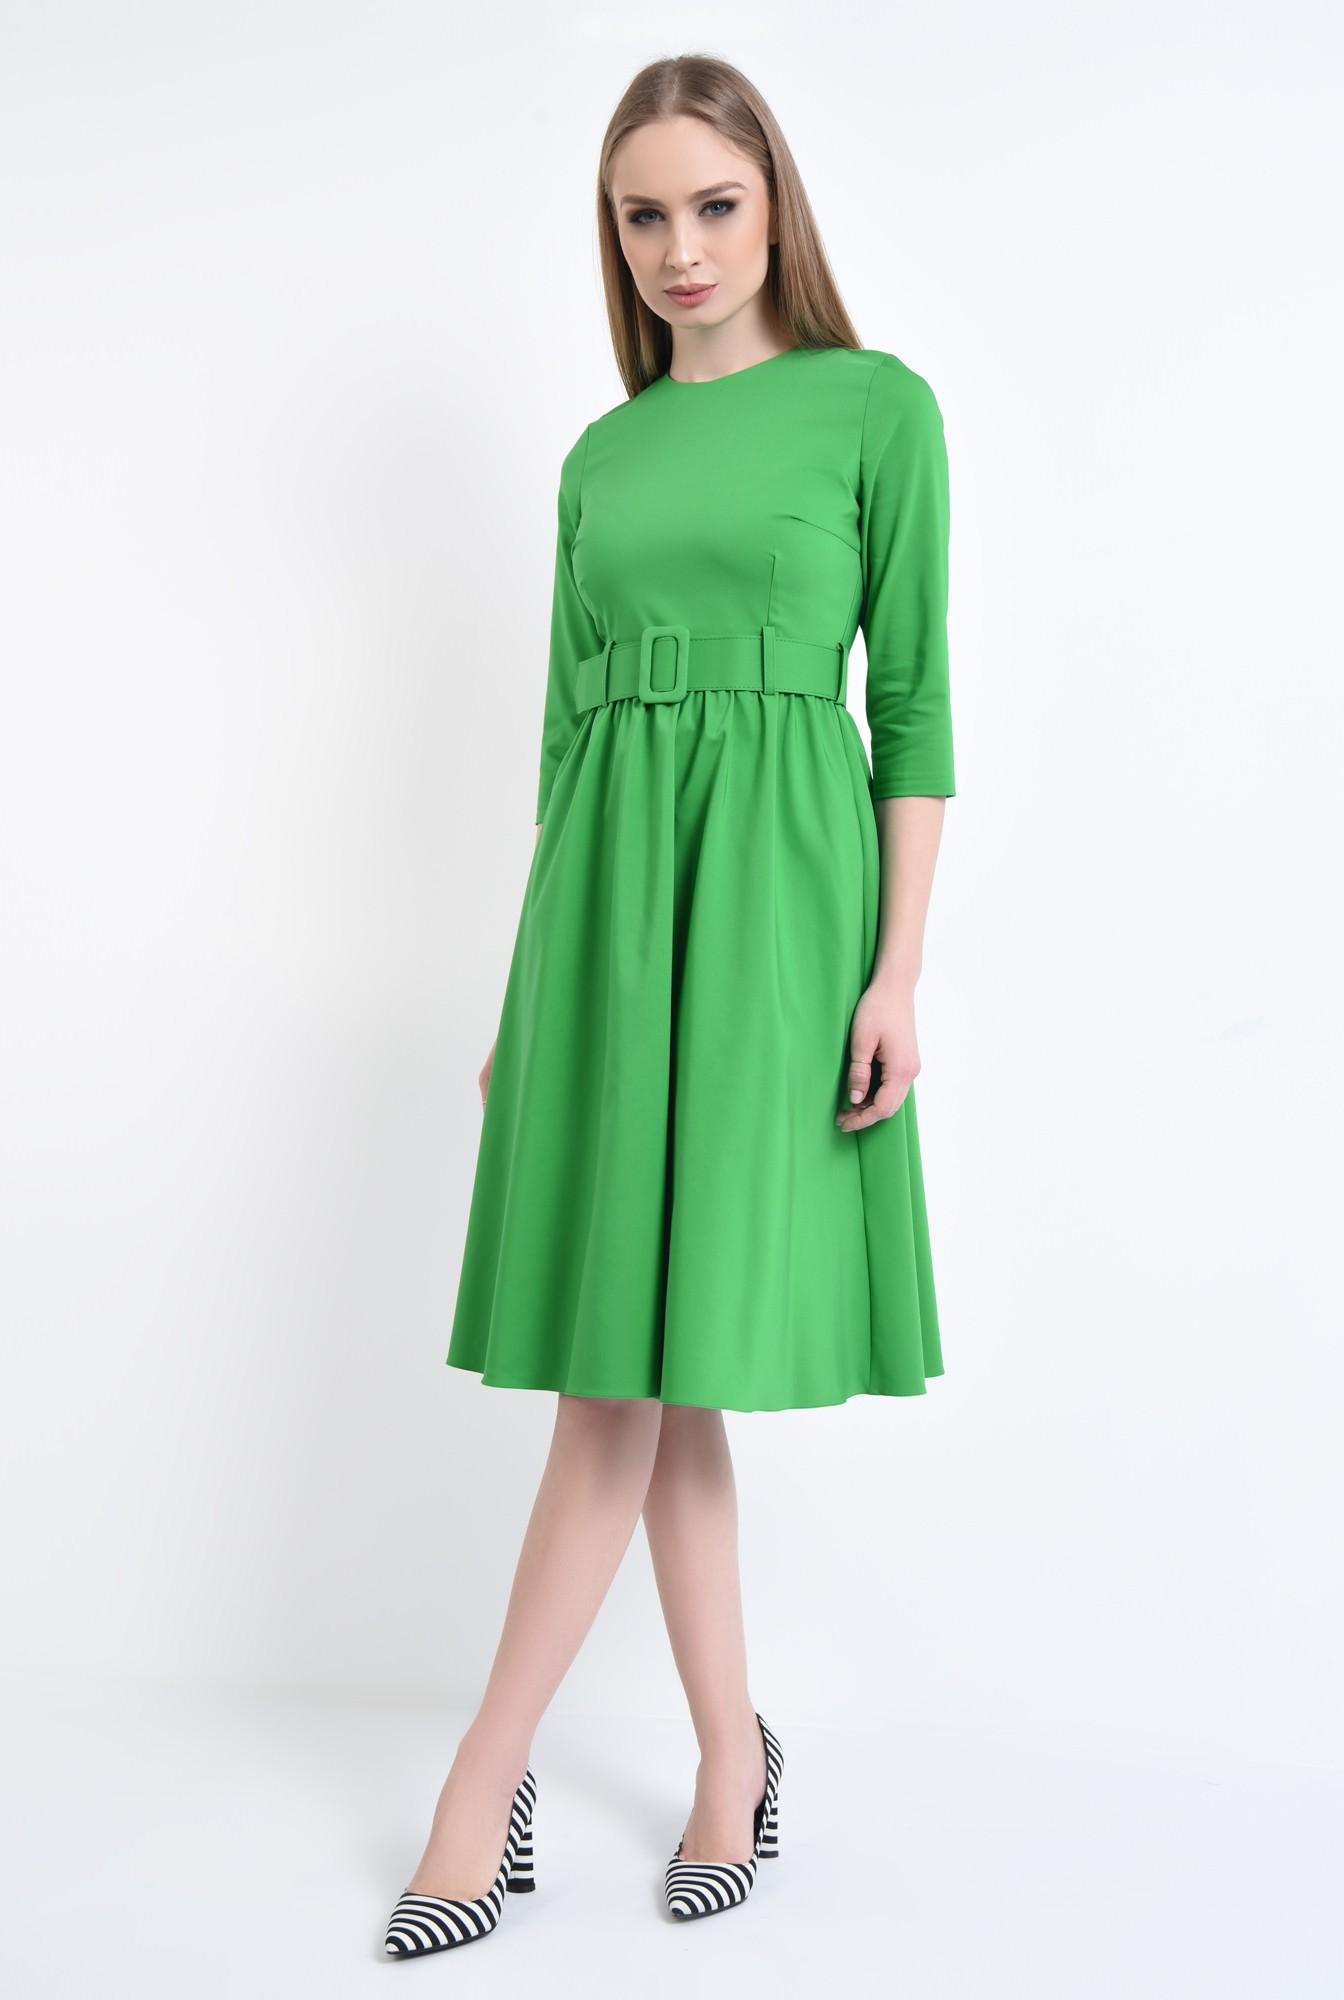 3 - Rochie casual, verde